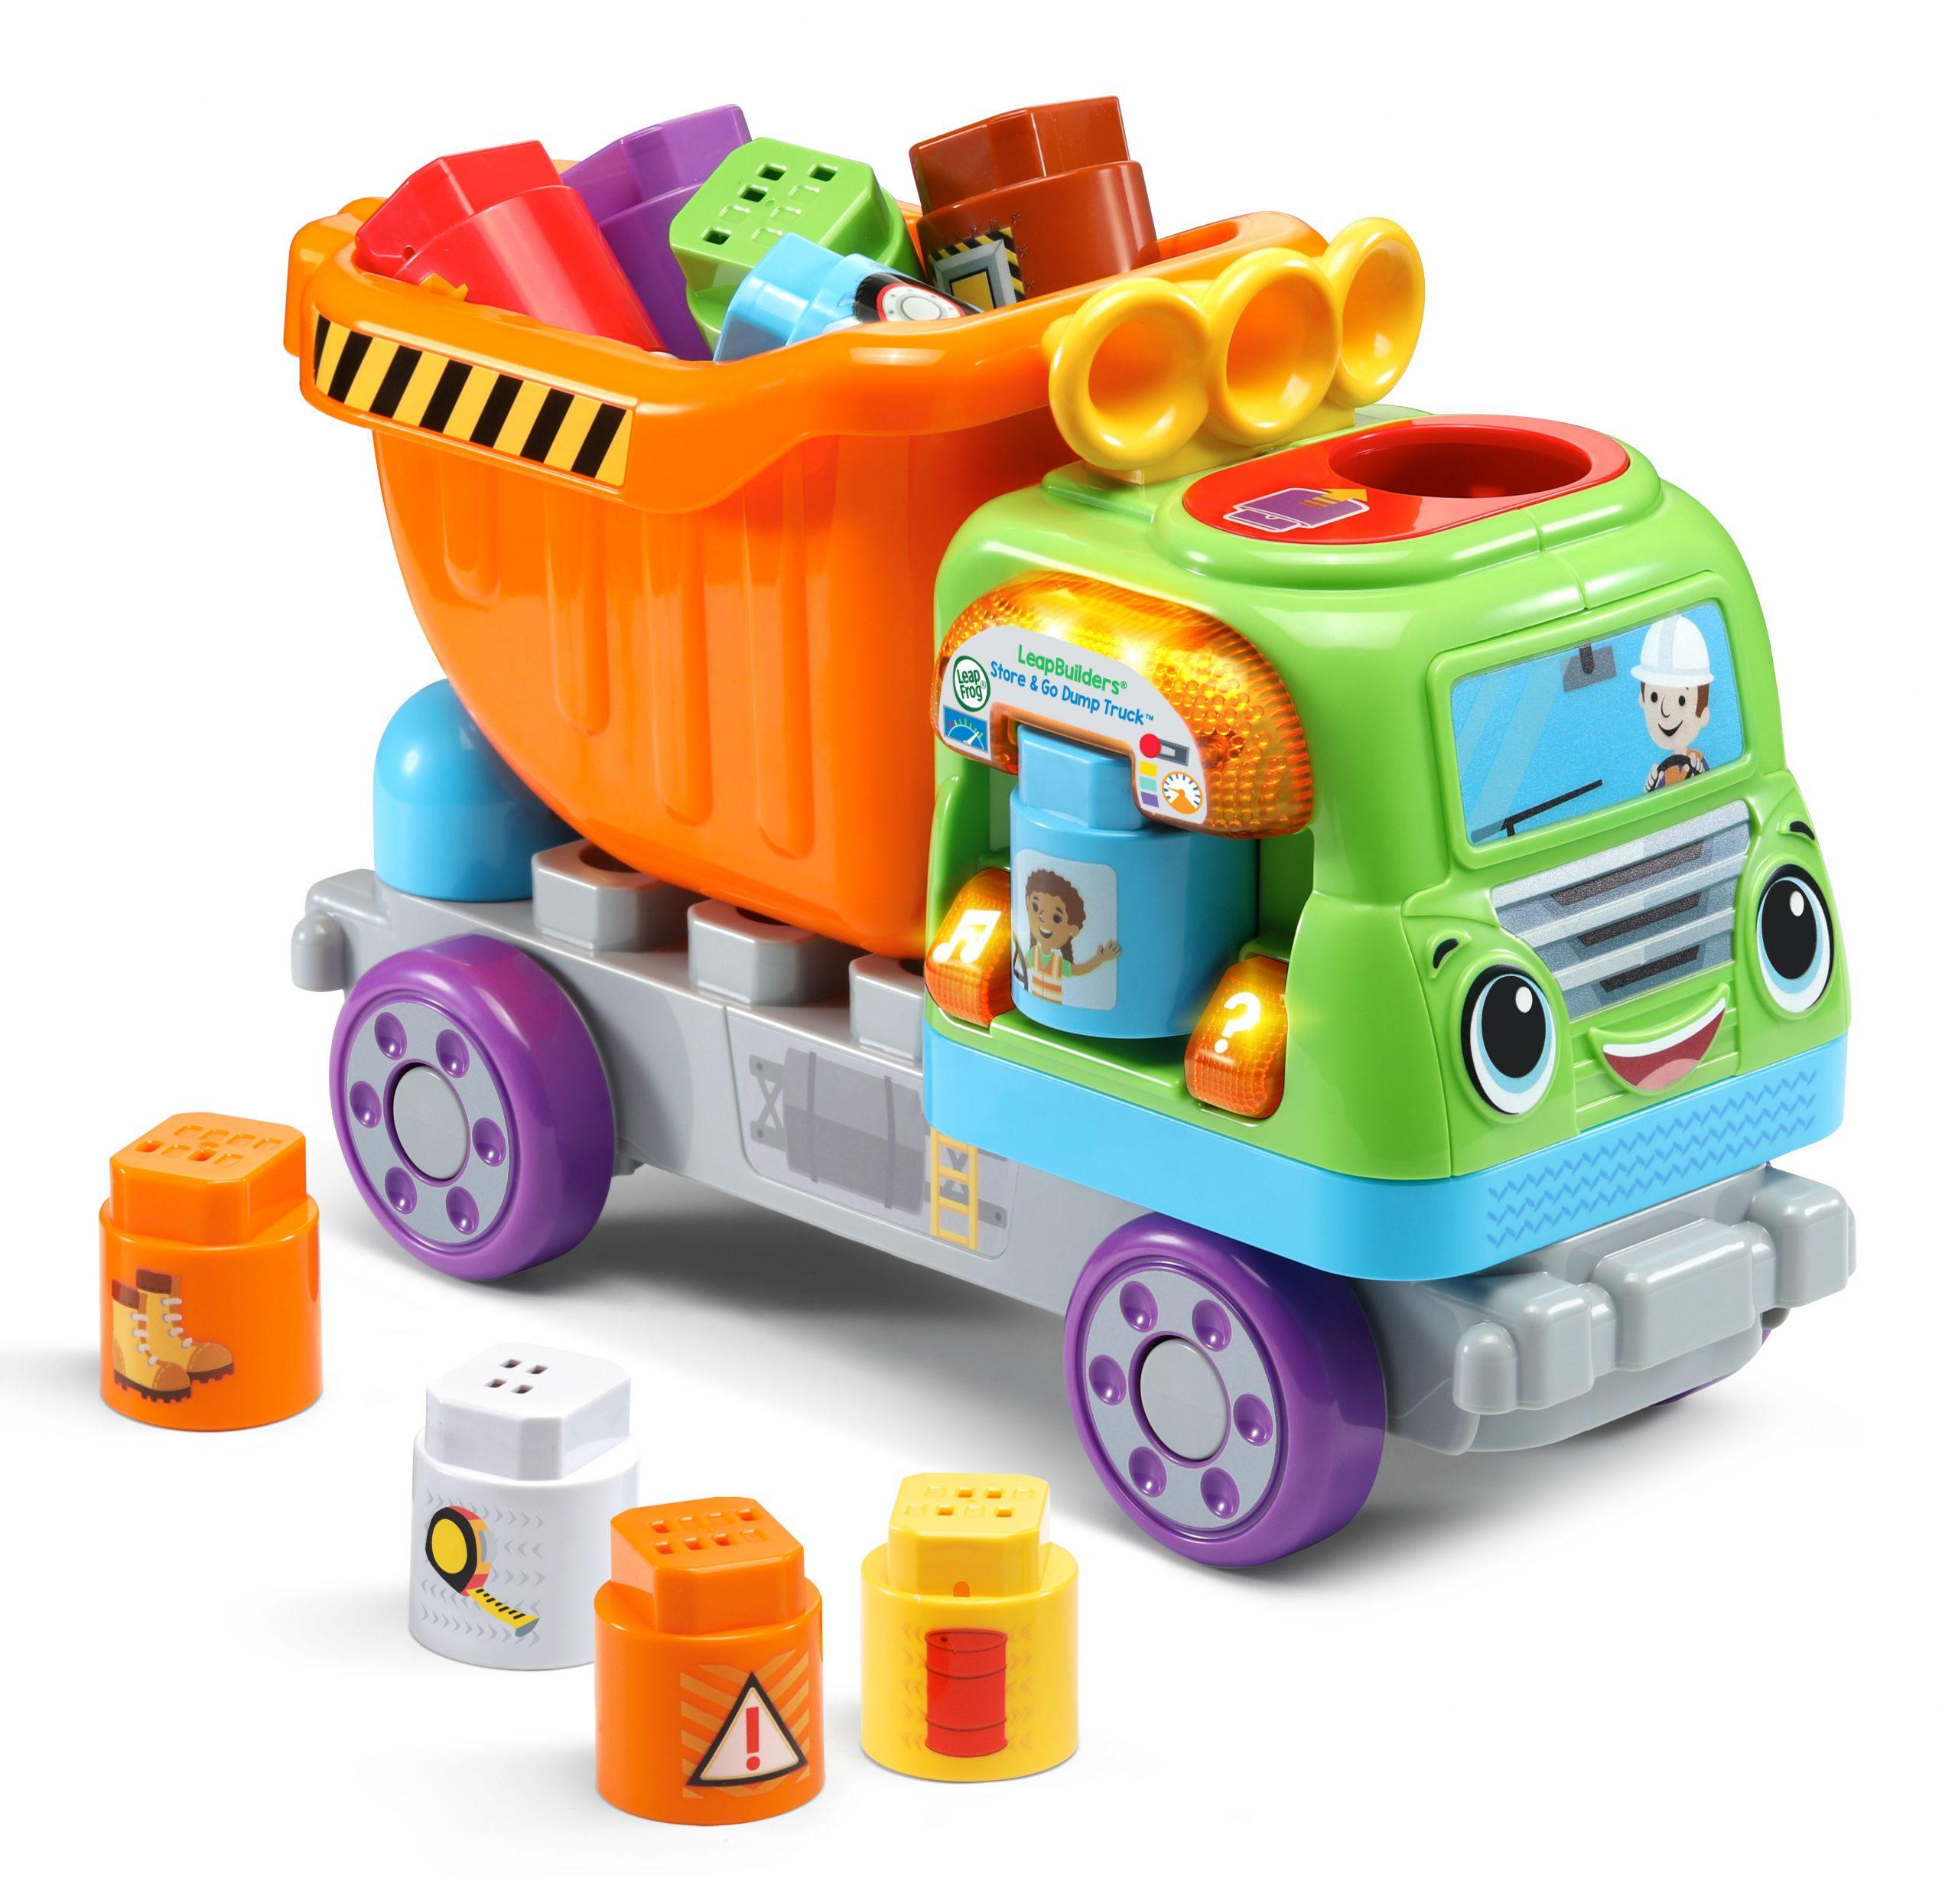 LeapBuilders Store & Go Dump Truck